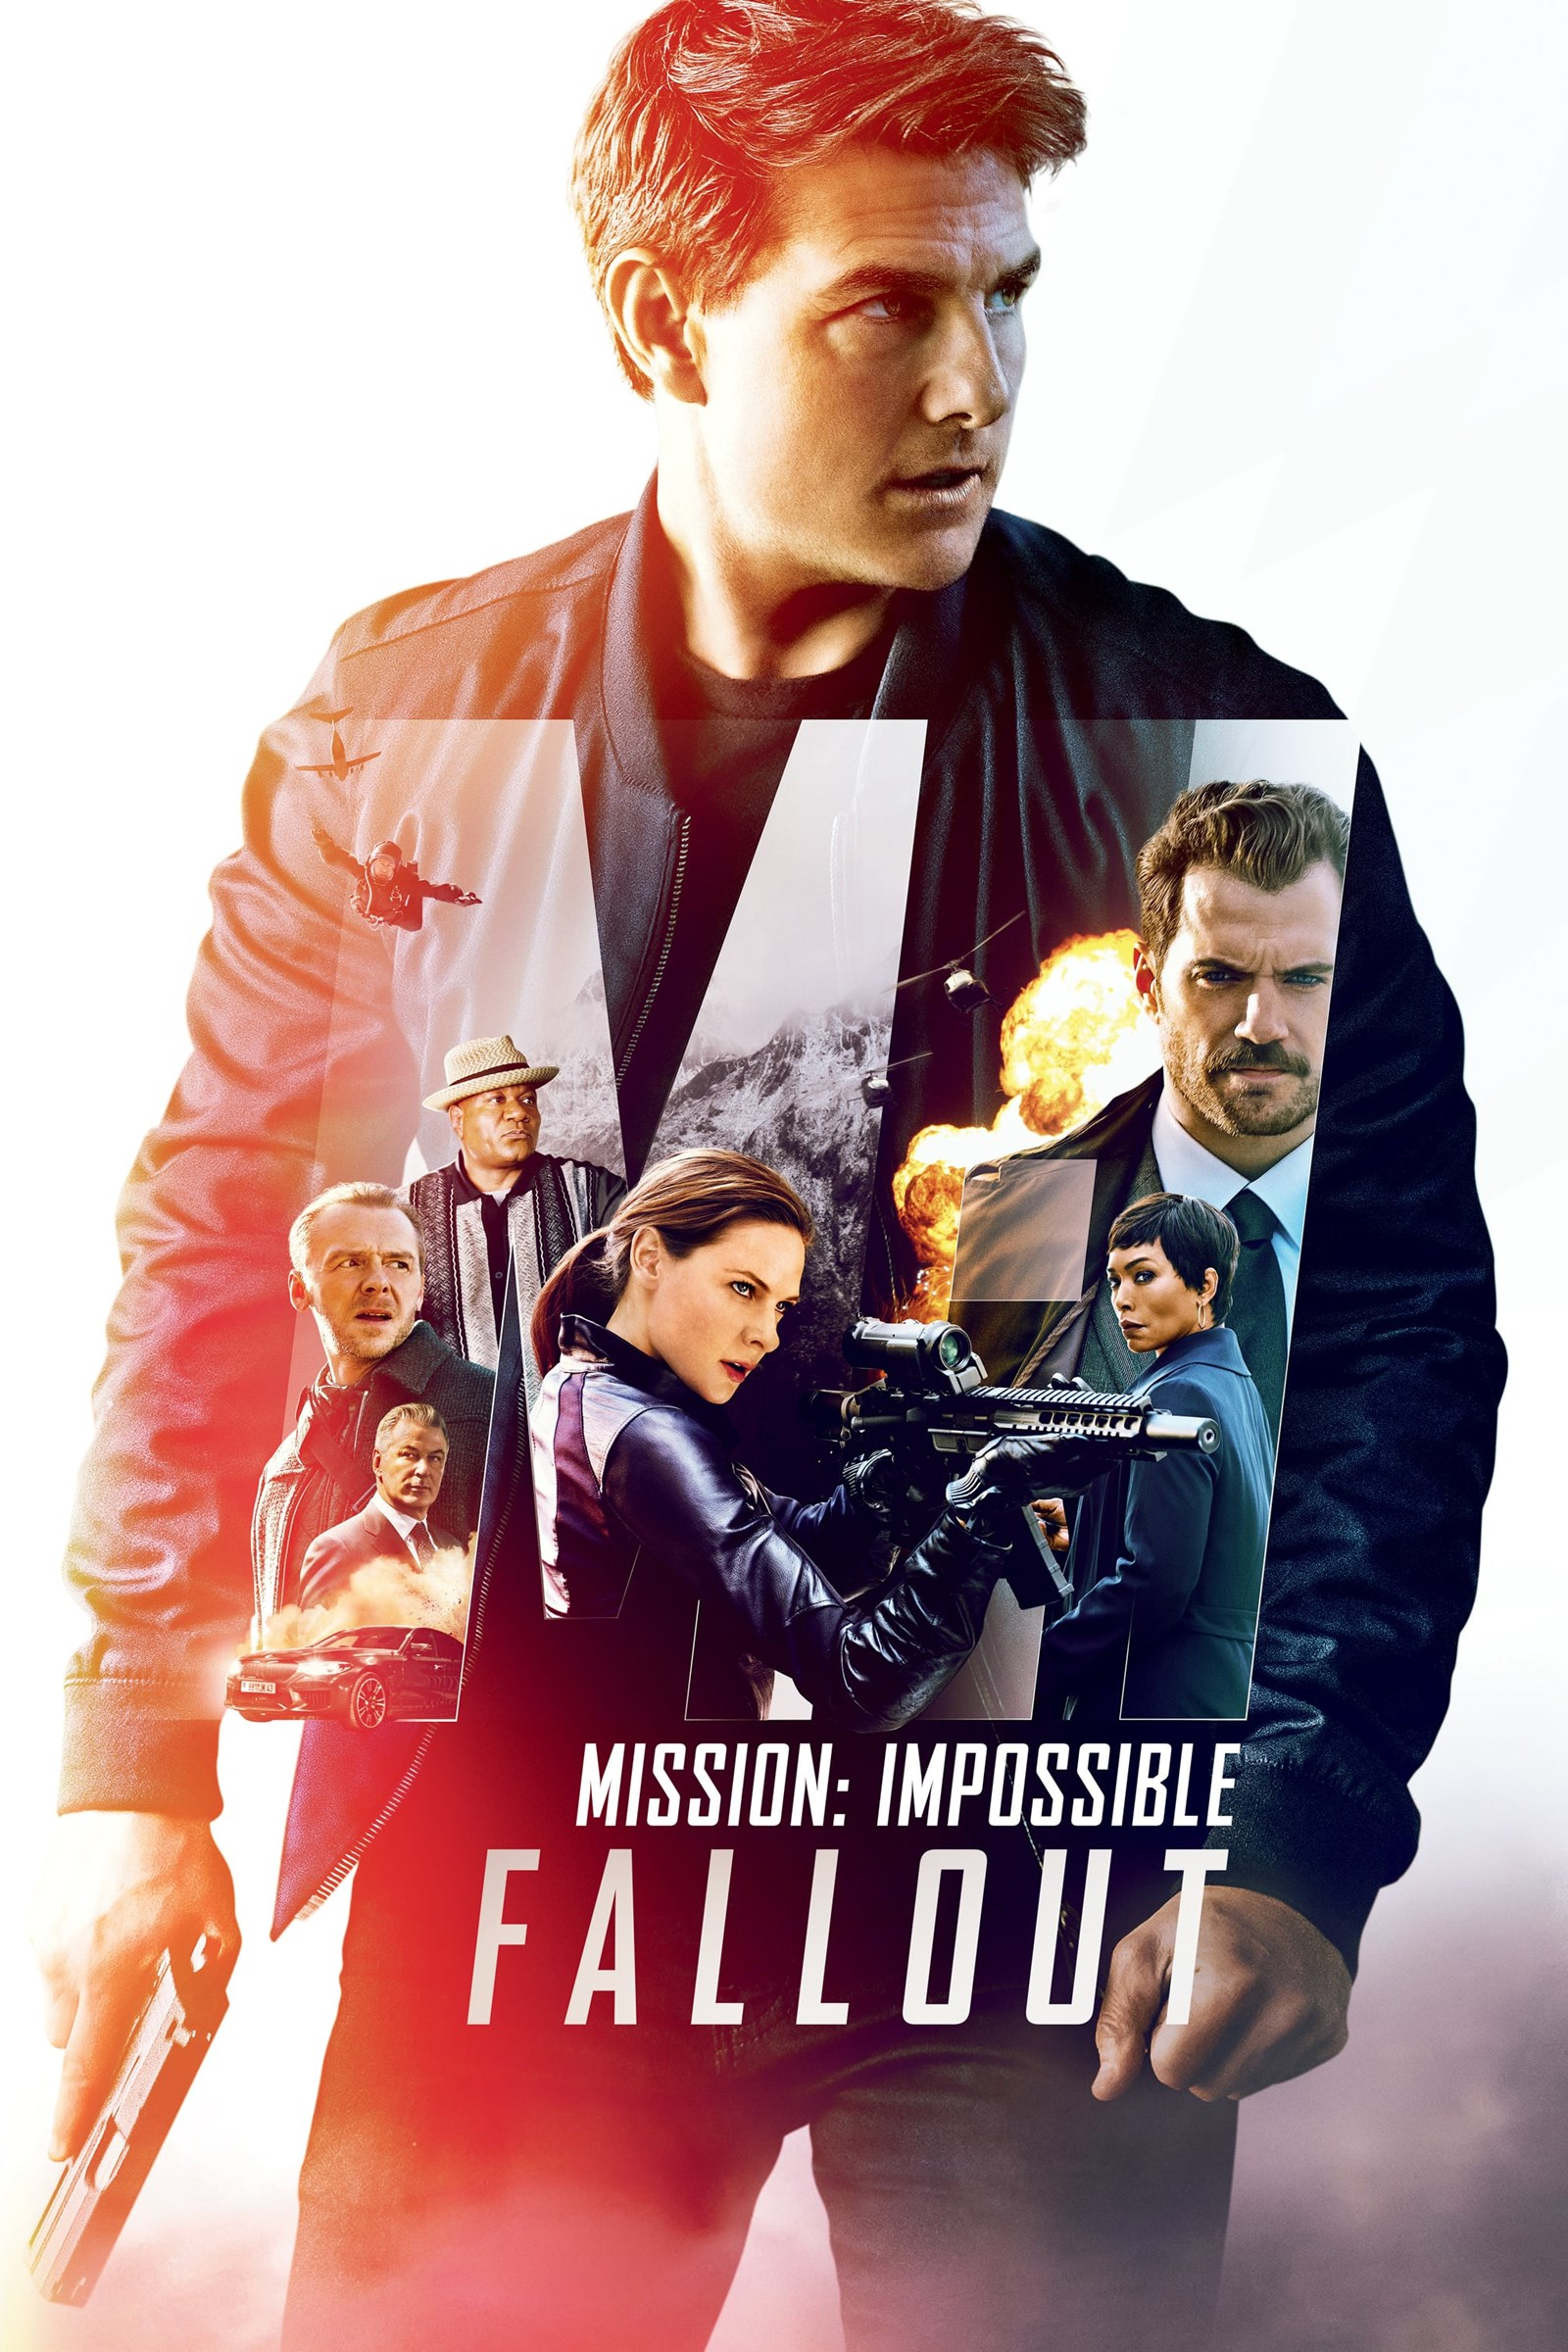 Subscene - Mission: Impossible - Fallout English subtitle